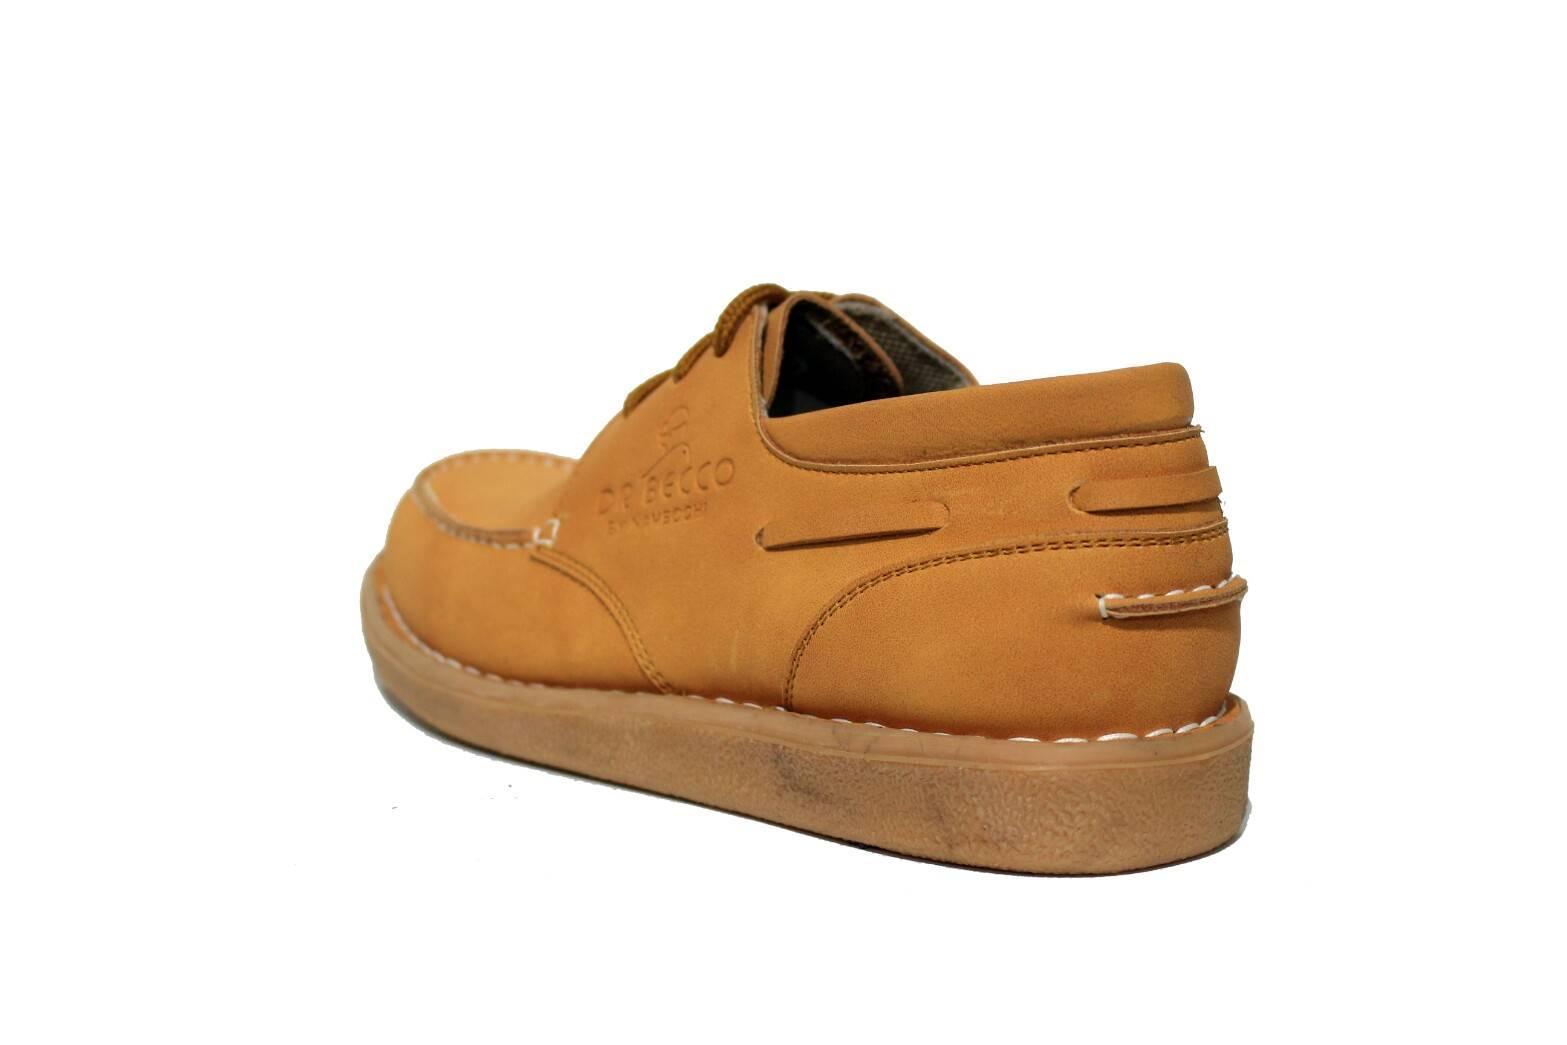 Sepatu Boots Kulit Pria Original Dr.Becco - Sepatu Boots Pendek- Dr.Becco zapato